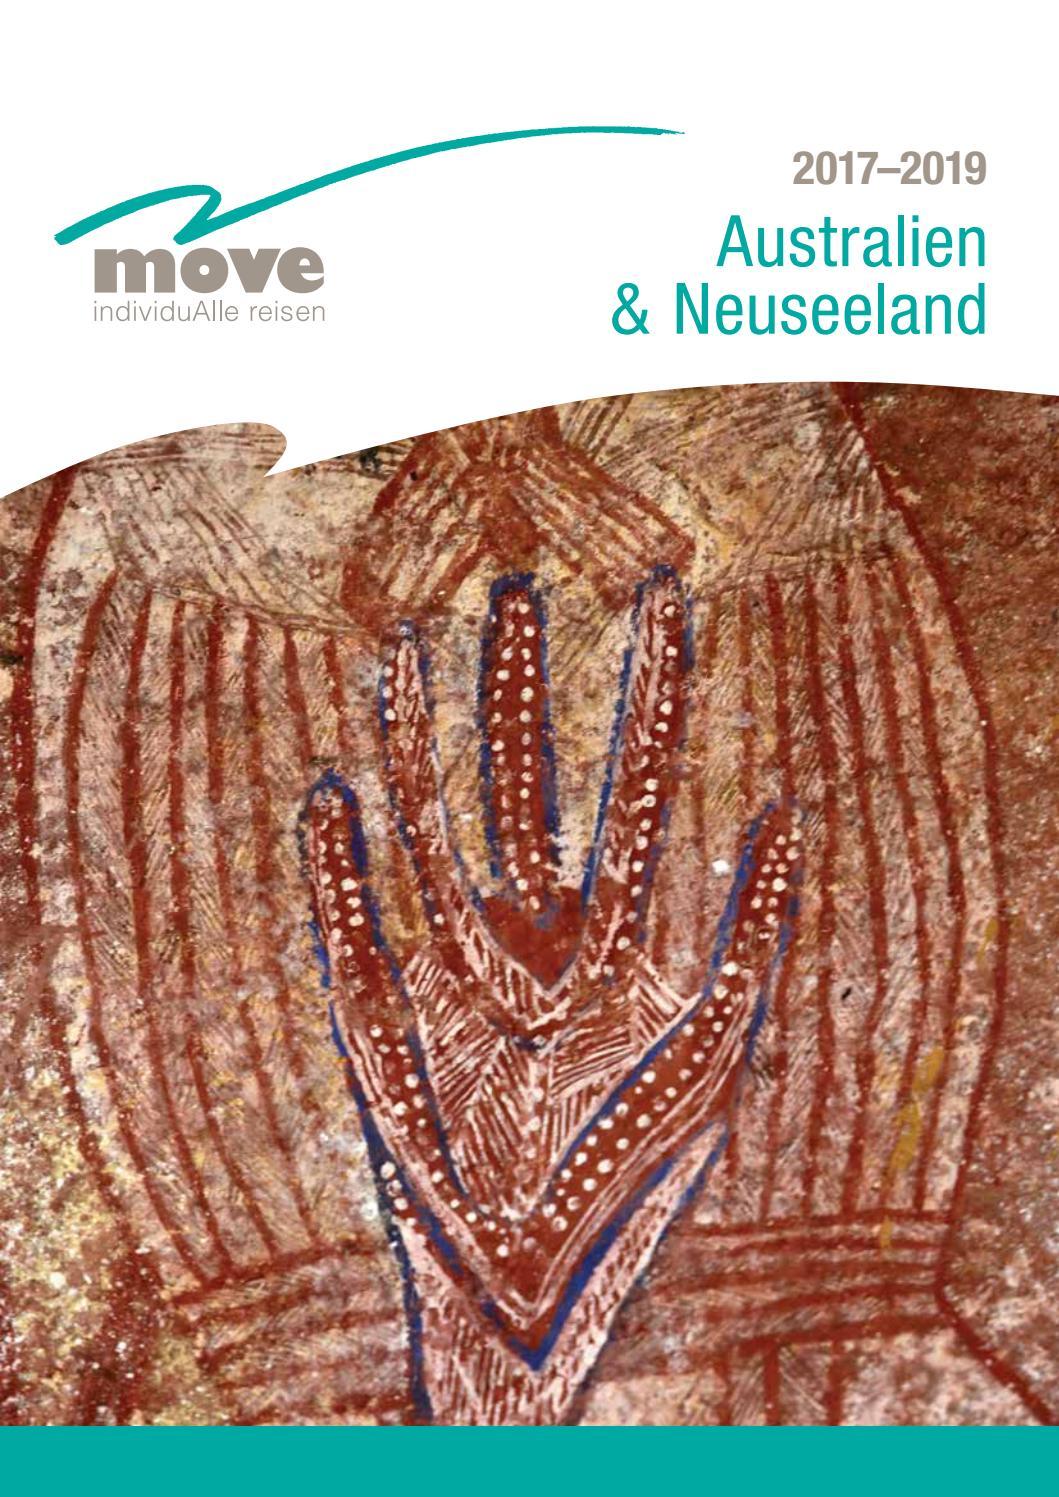 Destination Australia & New Zealand 17-19 by Move Riesen by koolivoo ...